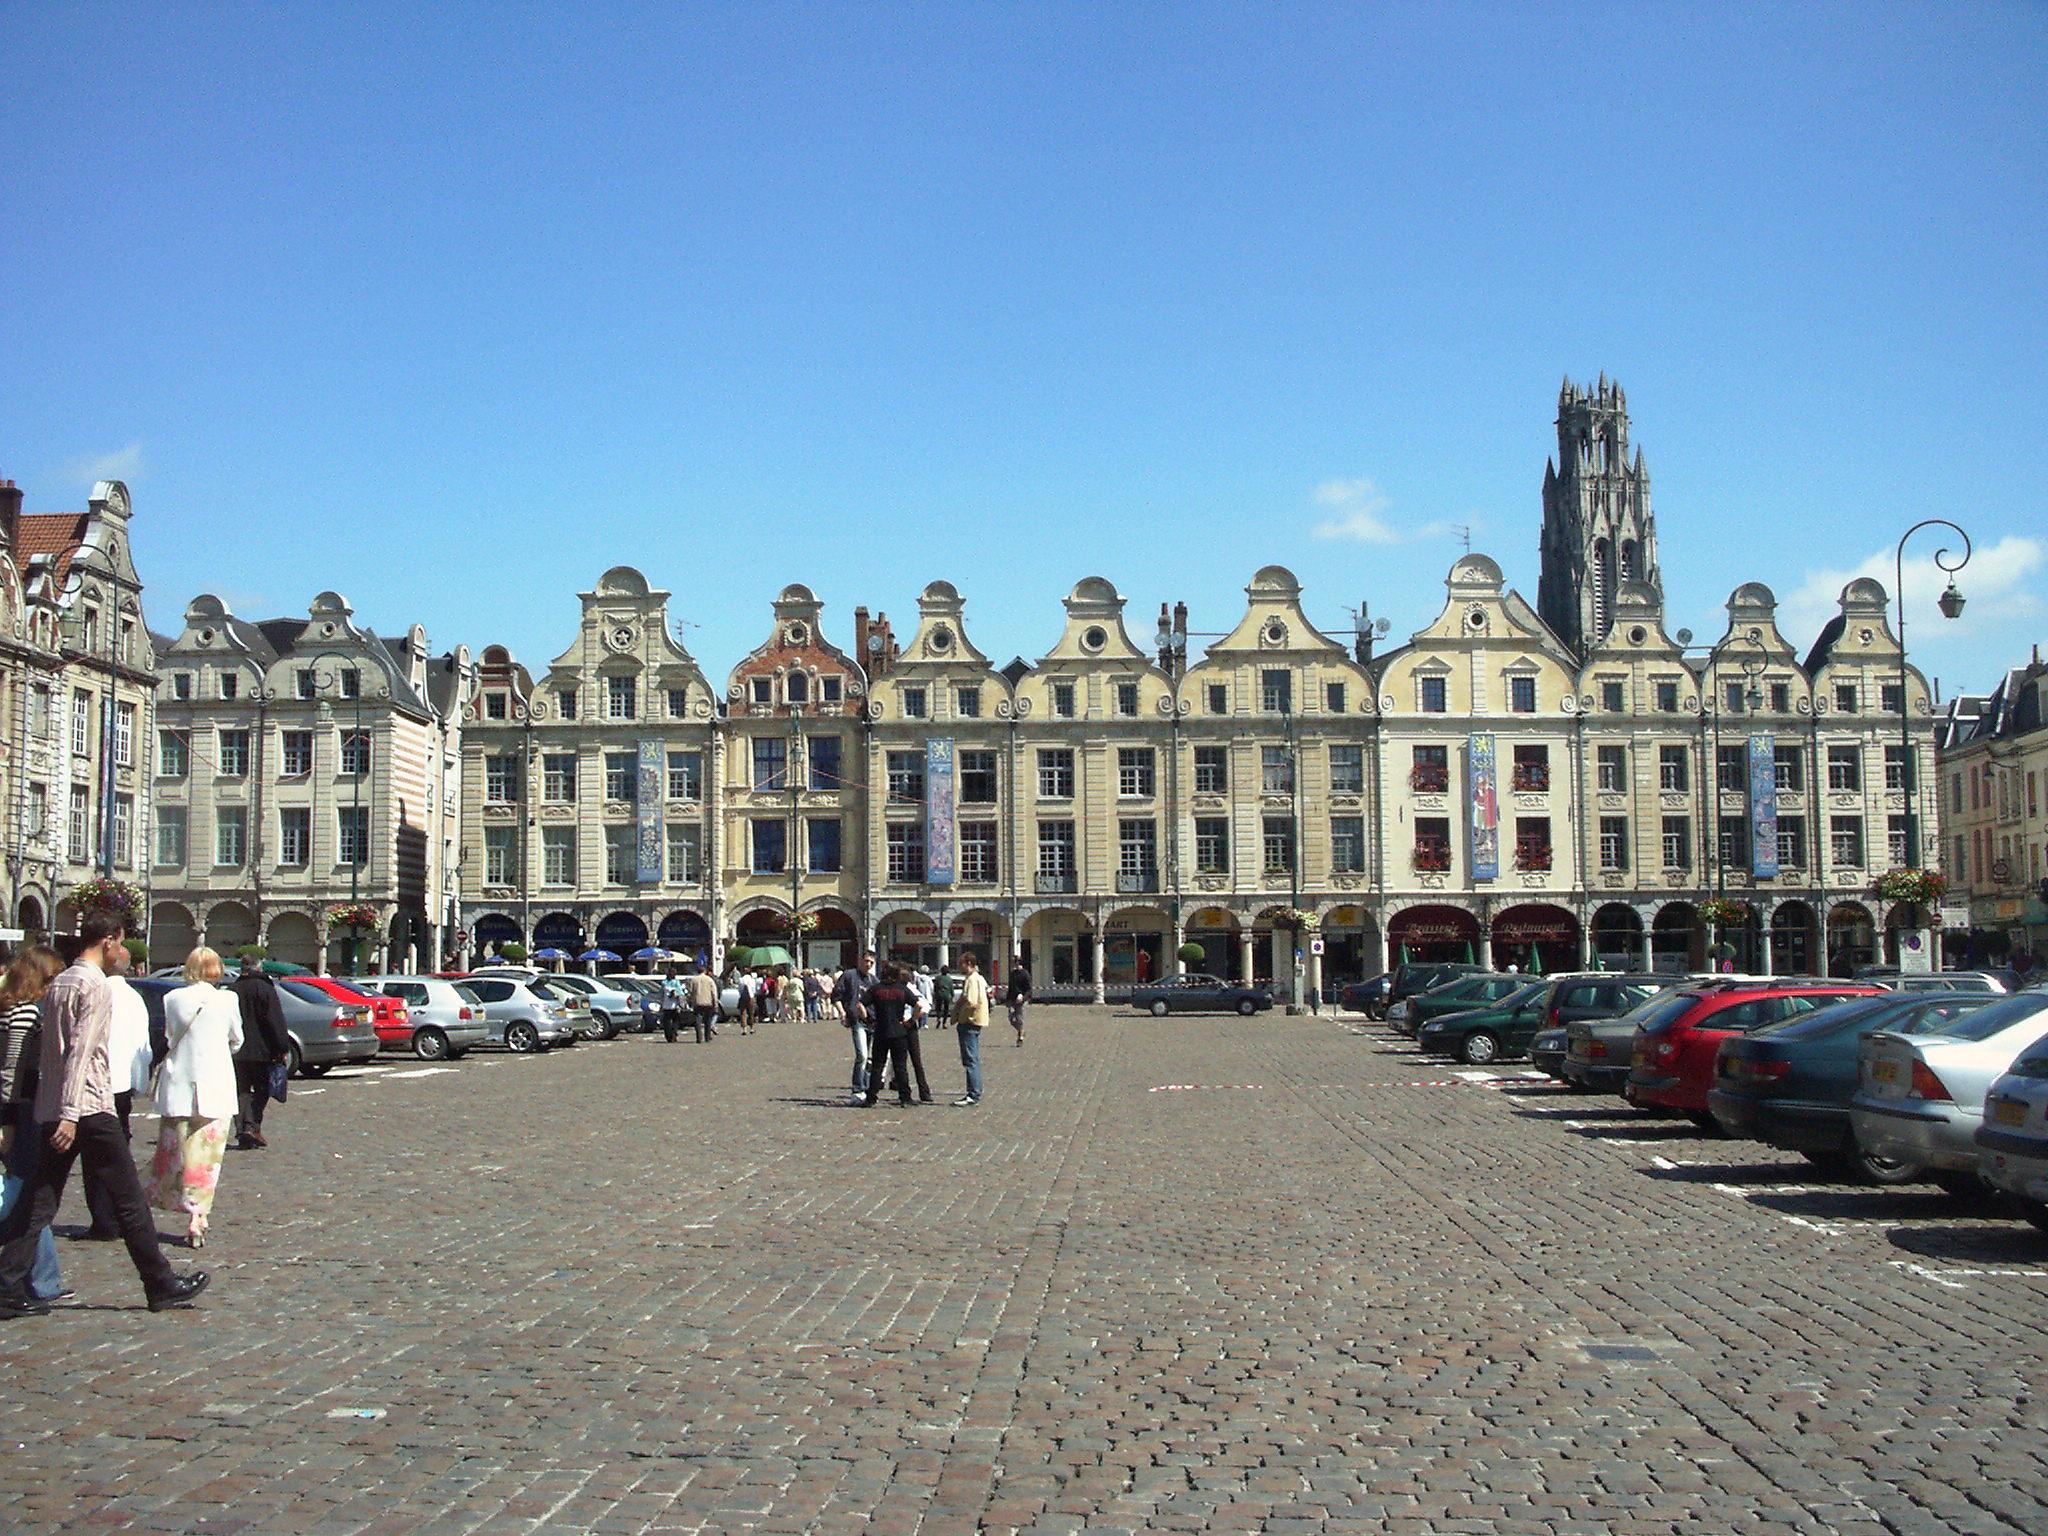 Arras Simple English Wikipedia, the free encyclopedia